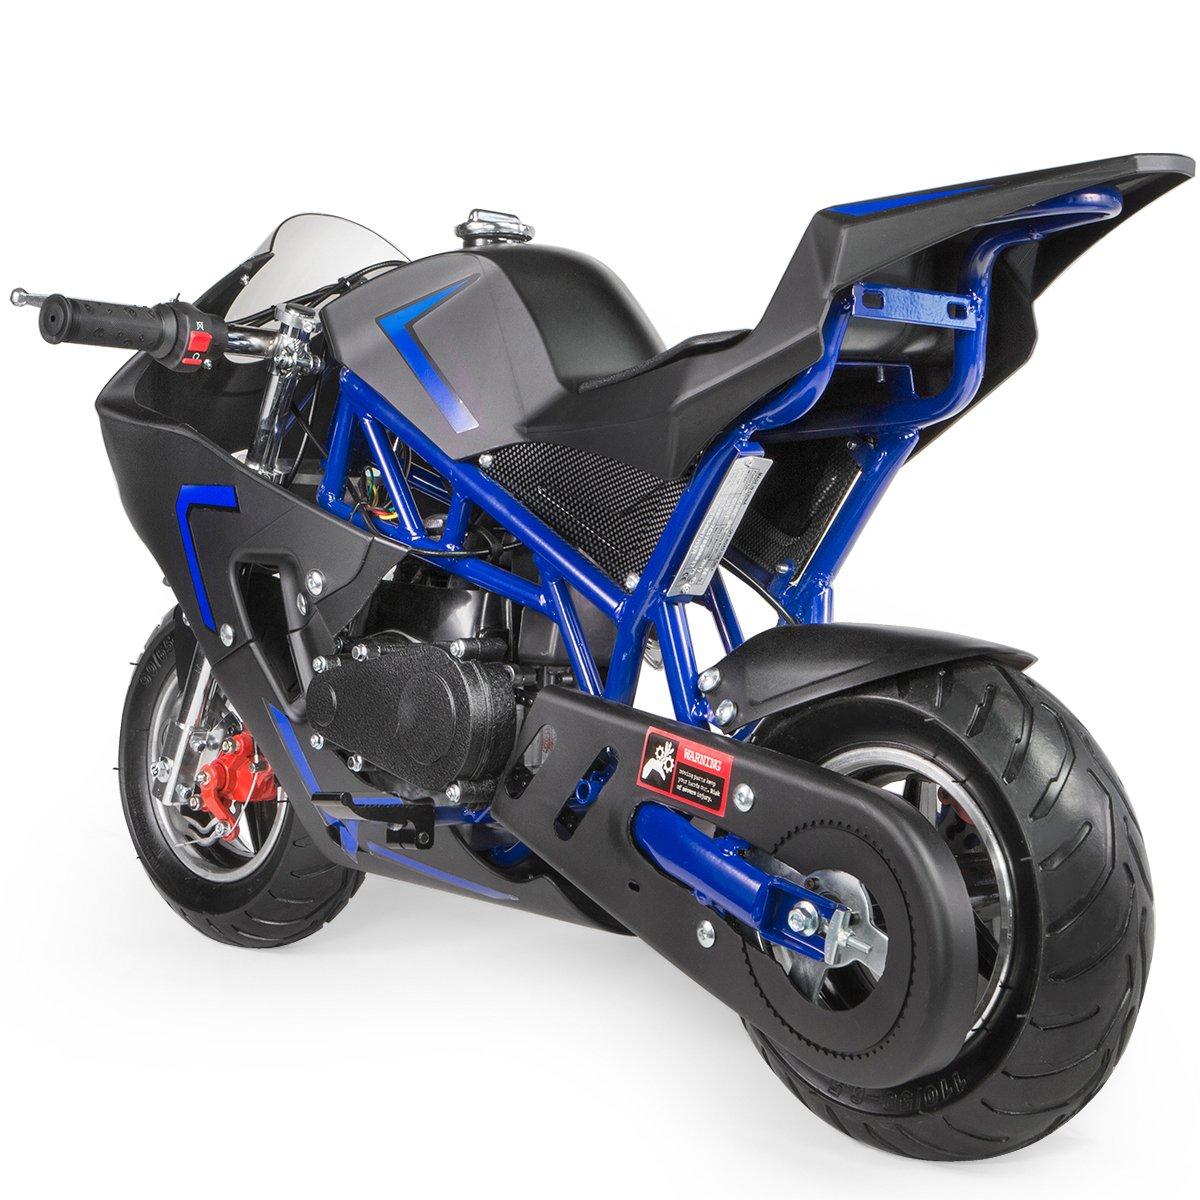 Xtremepowerus 40cc 4 Stroke Gas Power Mini Pocket 49cc 2 Bike Wiring Diagram Motorcycle Ride On Blue Toys Games